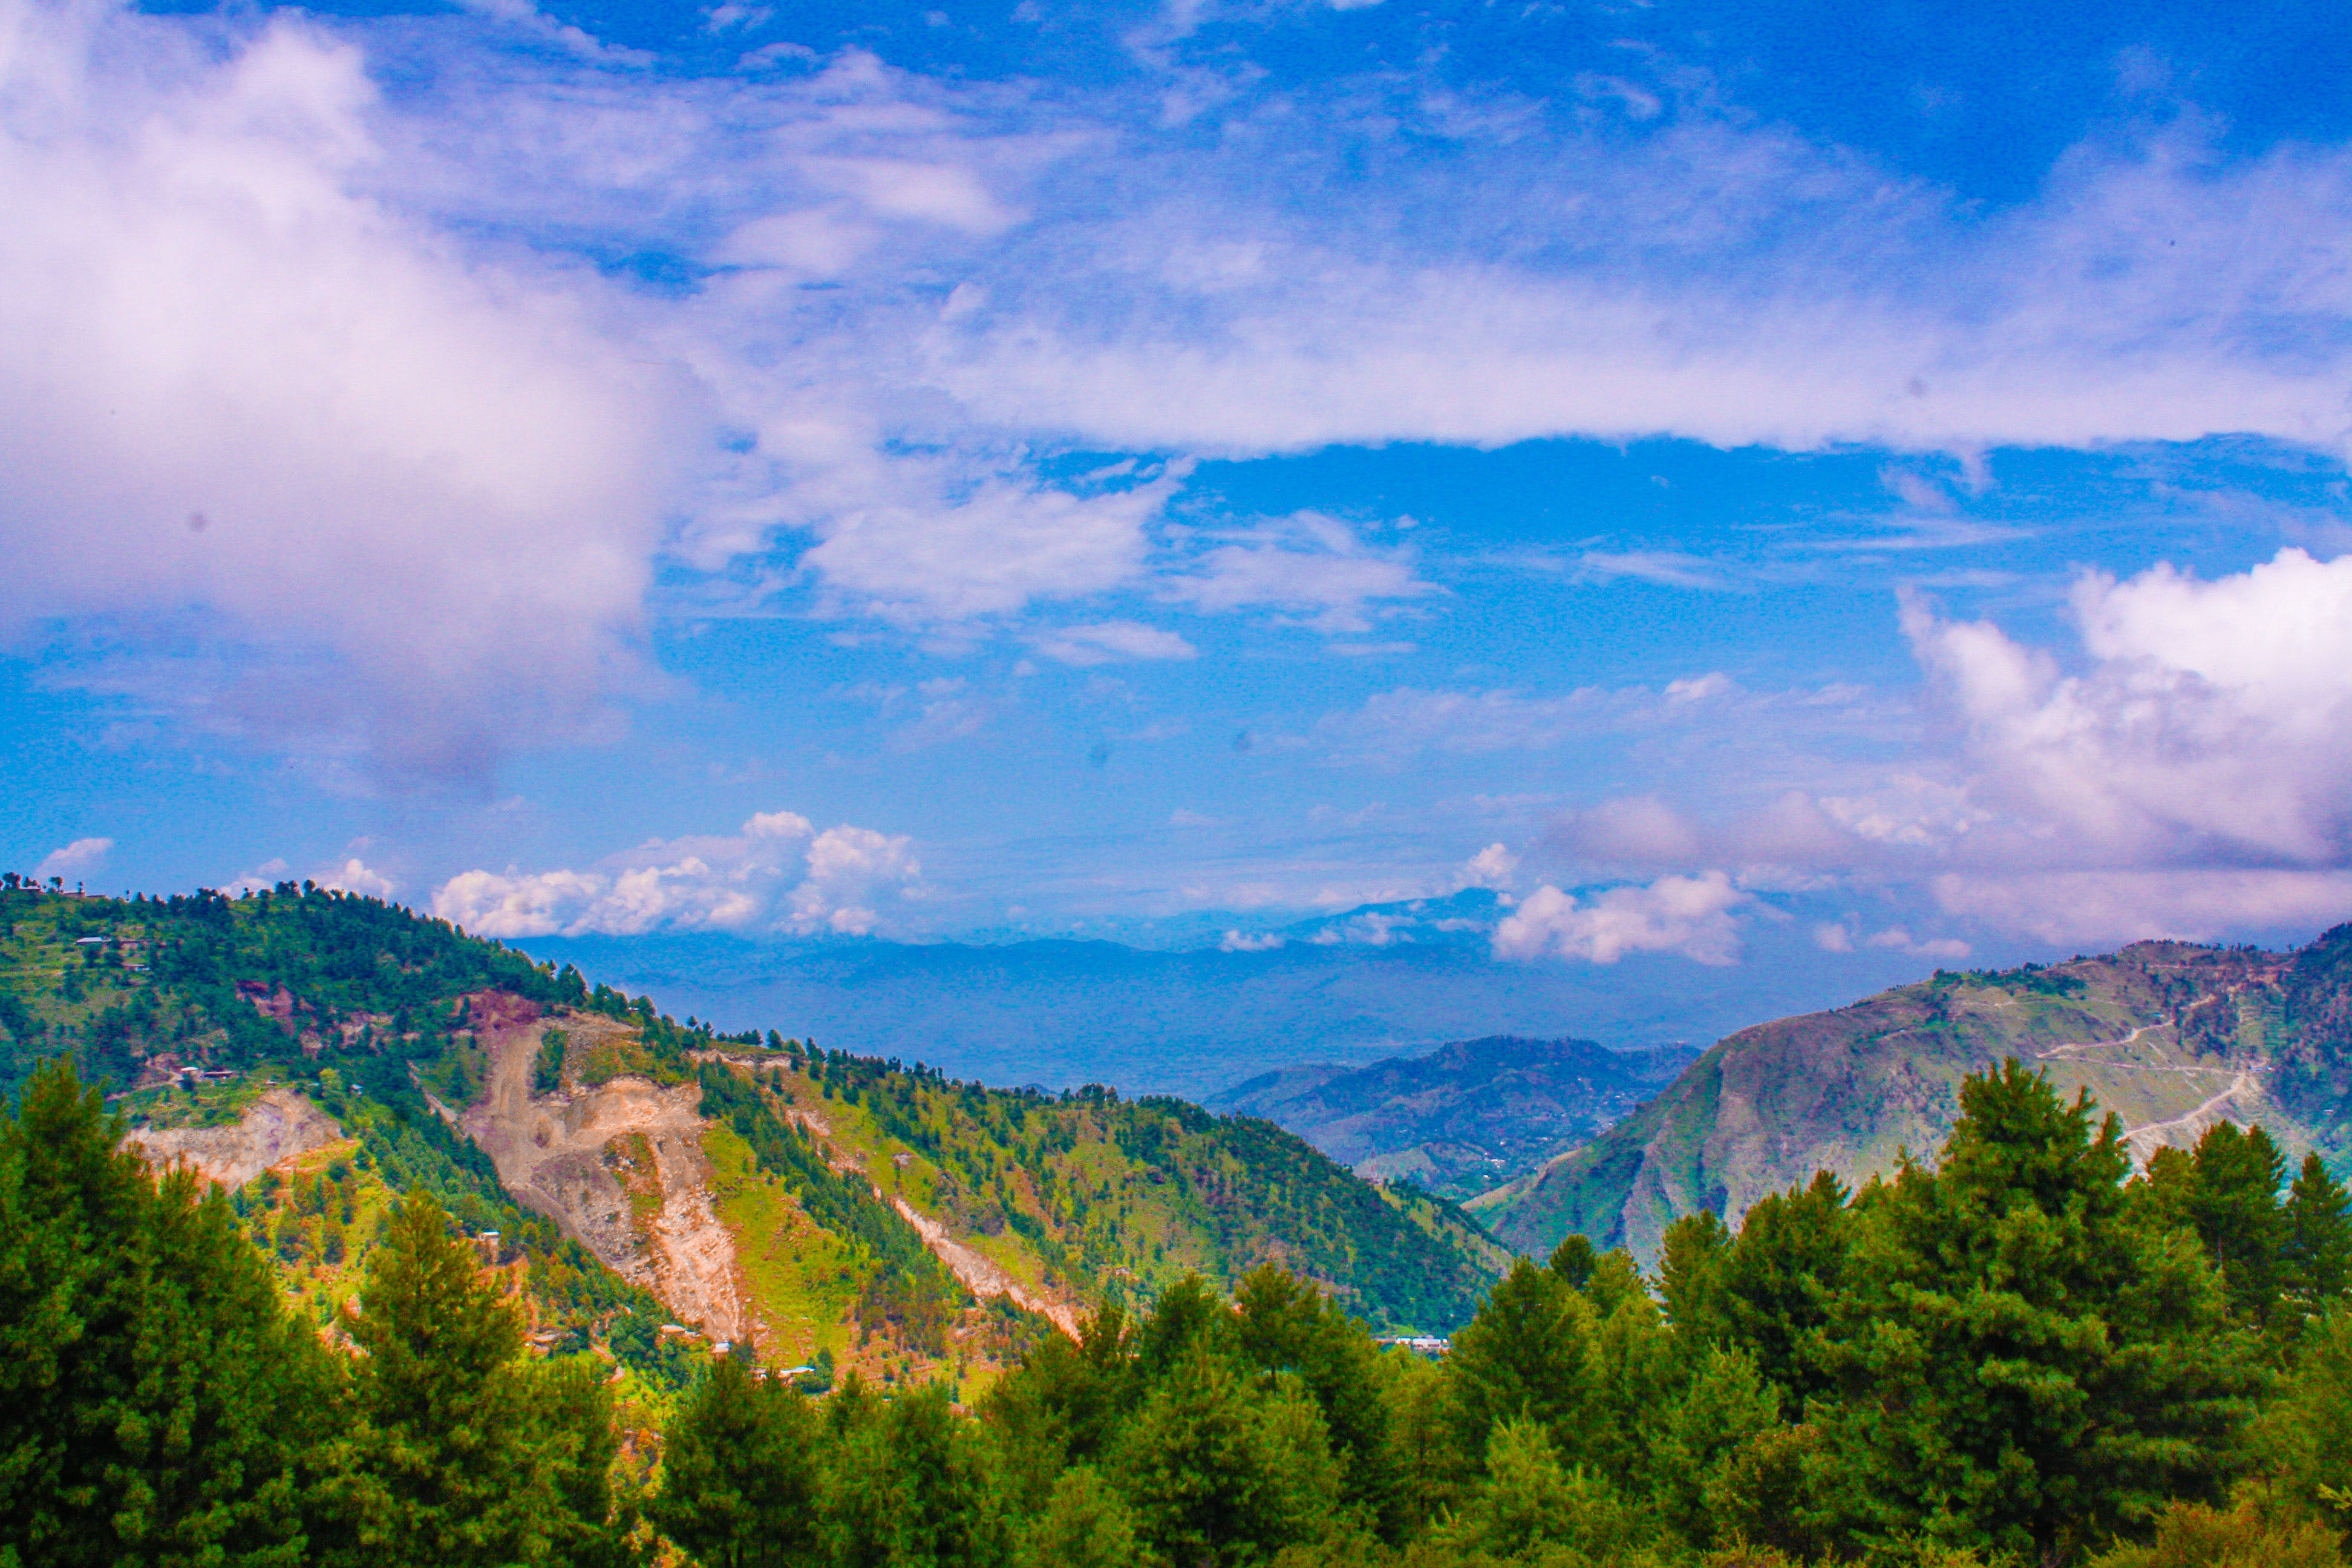 Free stock photo of beautiful view, city view, desktop wallpaper, grass land